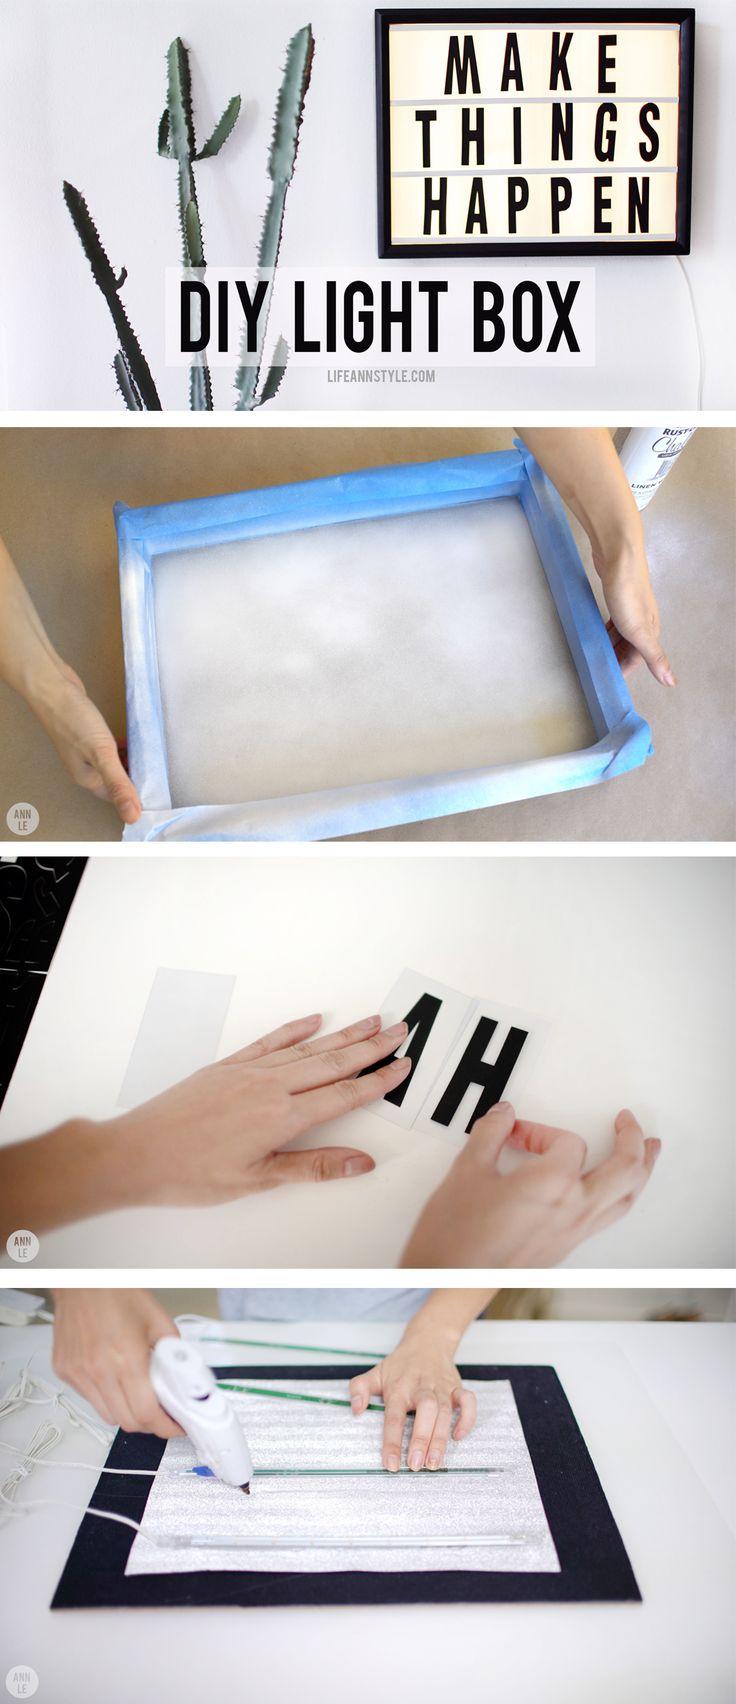 DIY LED LIGHT BOX HACK \ EASY Project